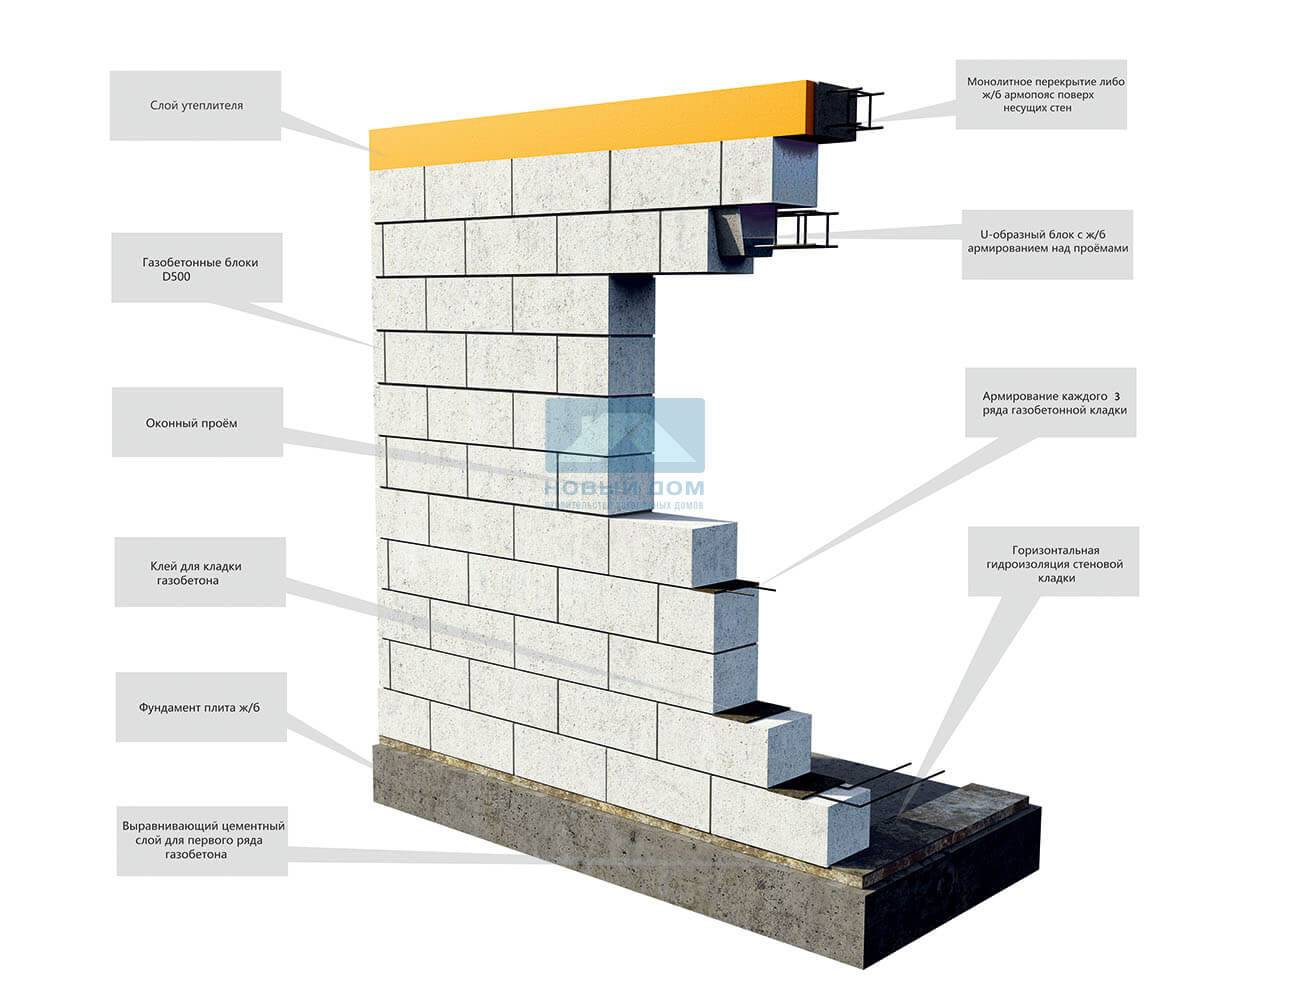 Газобетонные блоки сибит: характеристики, плюсы и минусы.